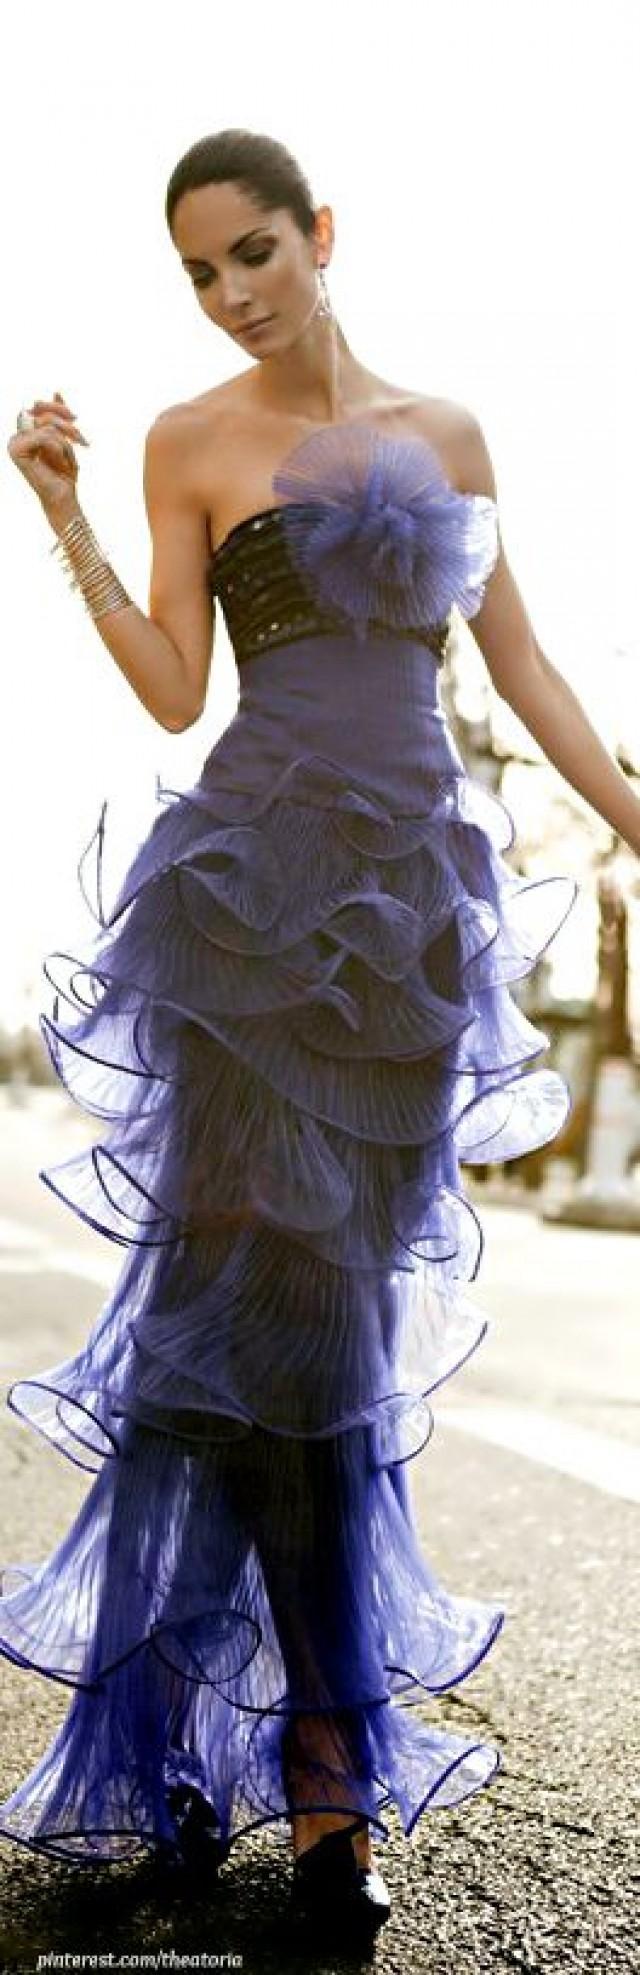 giorgio armani blue ruffled gown justinne stuff pinterest giorgio armani armani prive. Black Bedroom Furniture Sets. Home Design Ideas